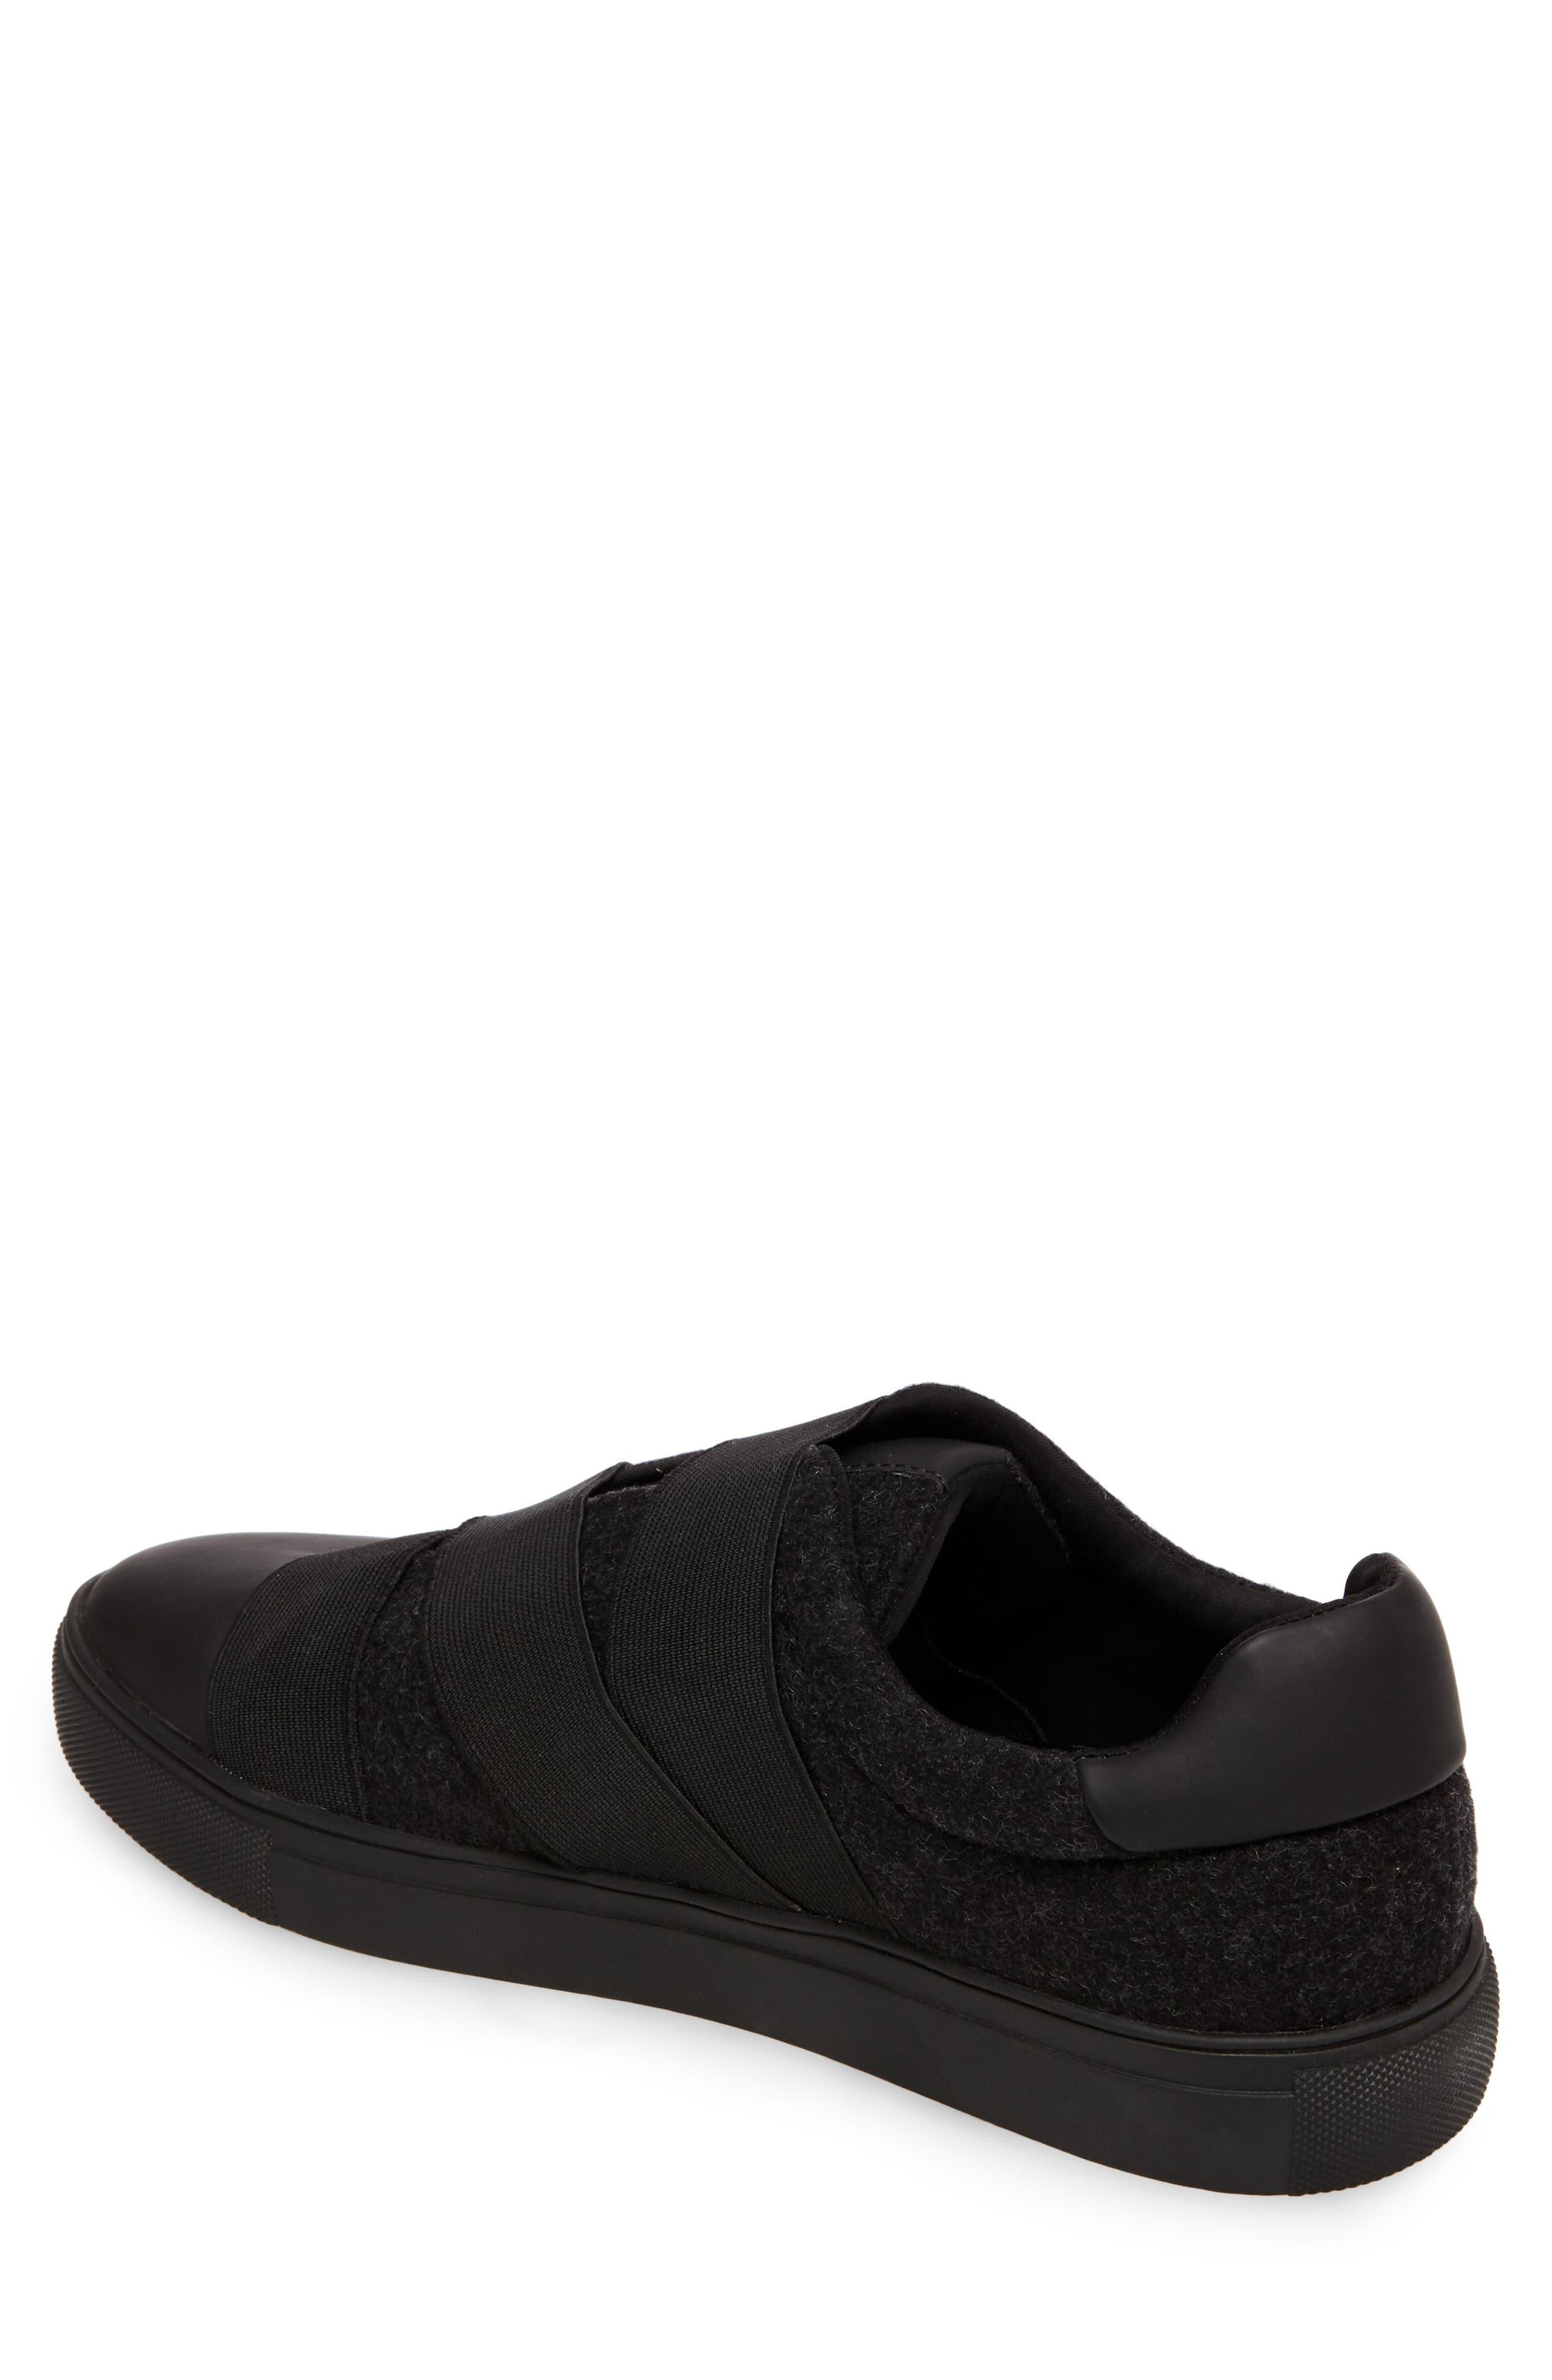 Westy Sneaker,                             Alternate thumbnail 2, color,                             002